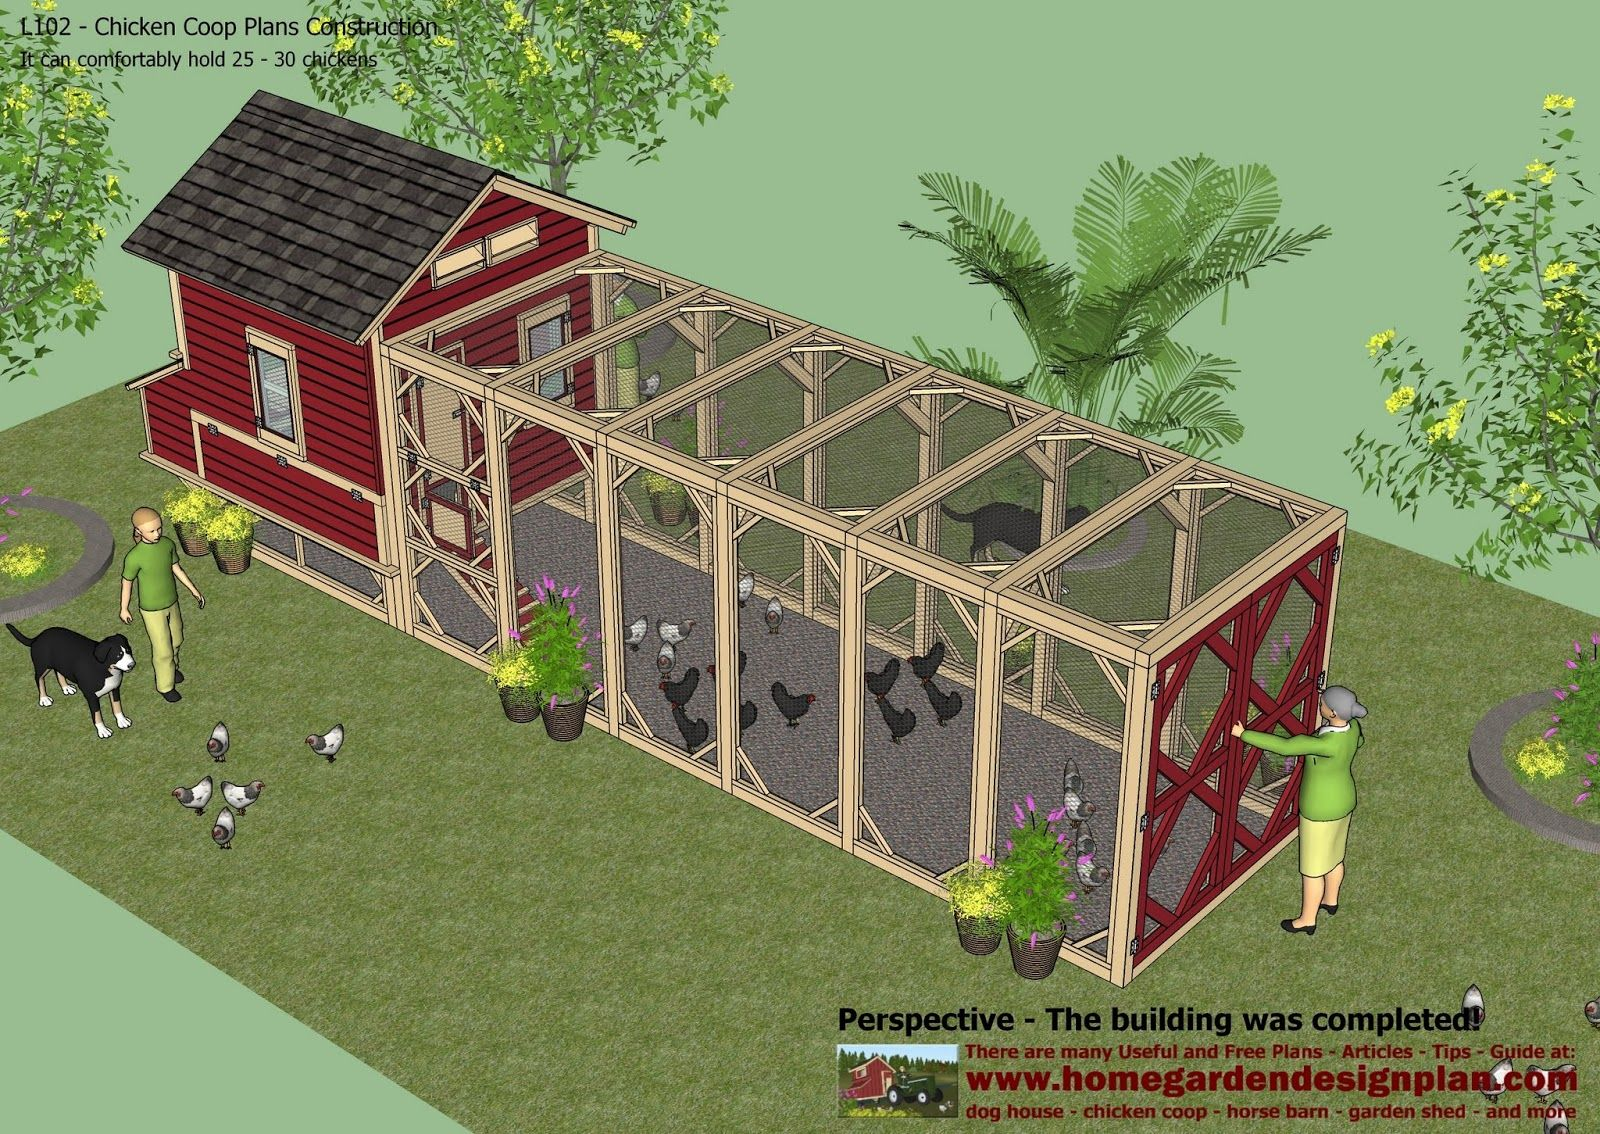 L102 Chicken Coop Plans Construction Chicken Coop Design How To Build A Chicken Coop It C Chicken Coop Plans Chicken Coop Designs Diy Chicken Coop Plans Backyard chicken coop design plans